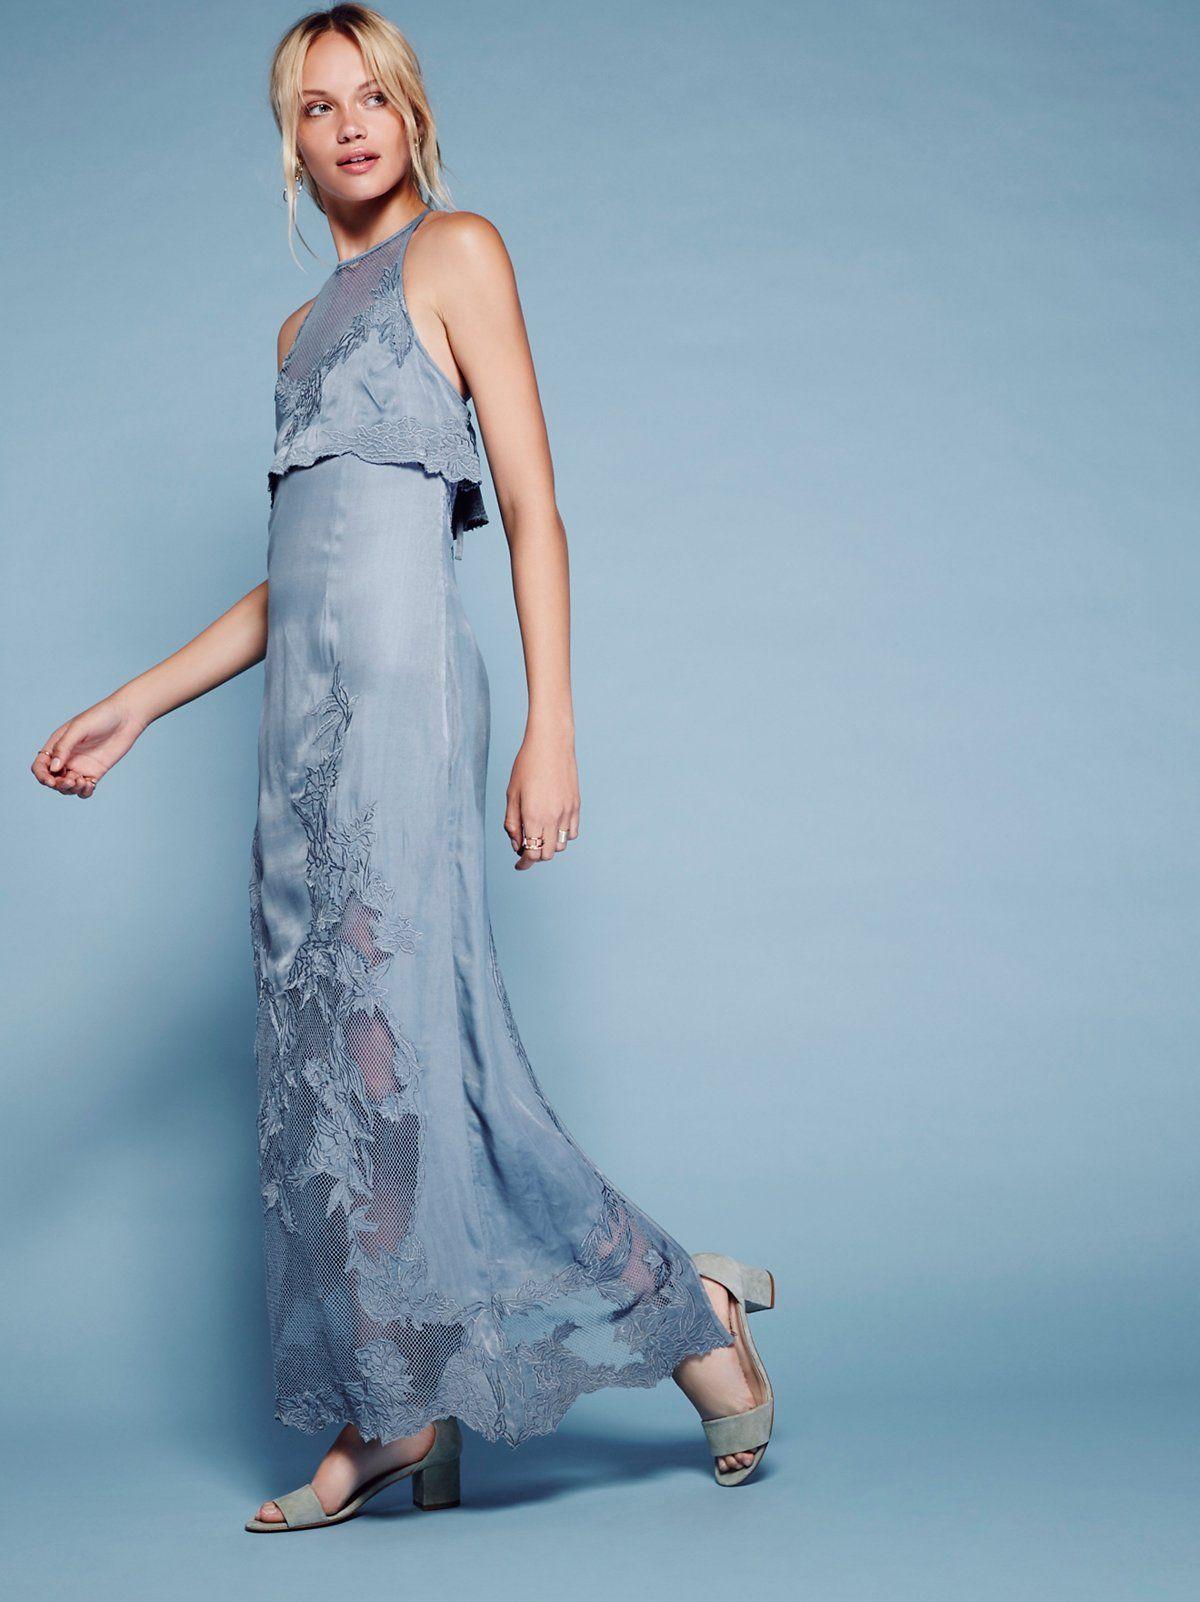 Moonchild Embroidered Maxi Dress   Made It.   Pinterest   Moonchild ...